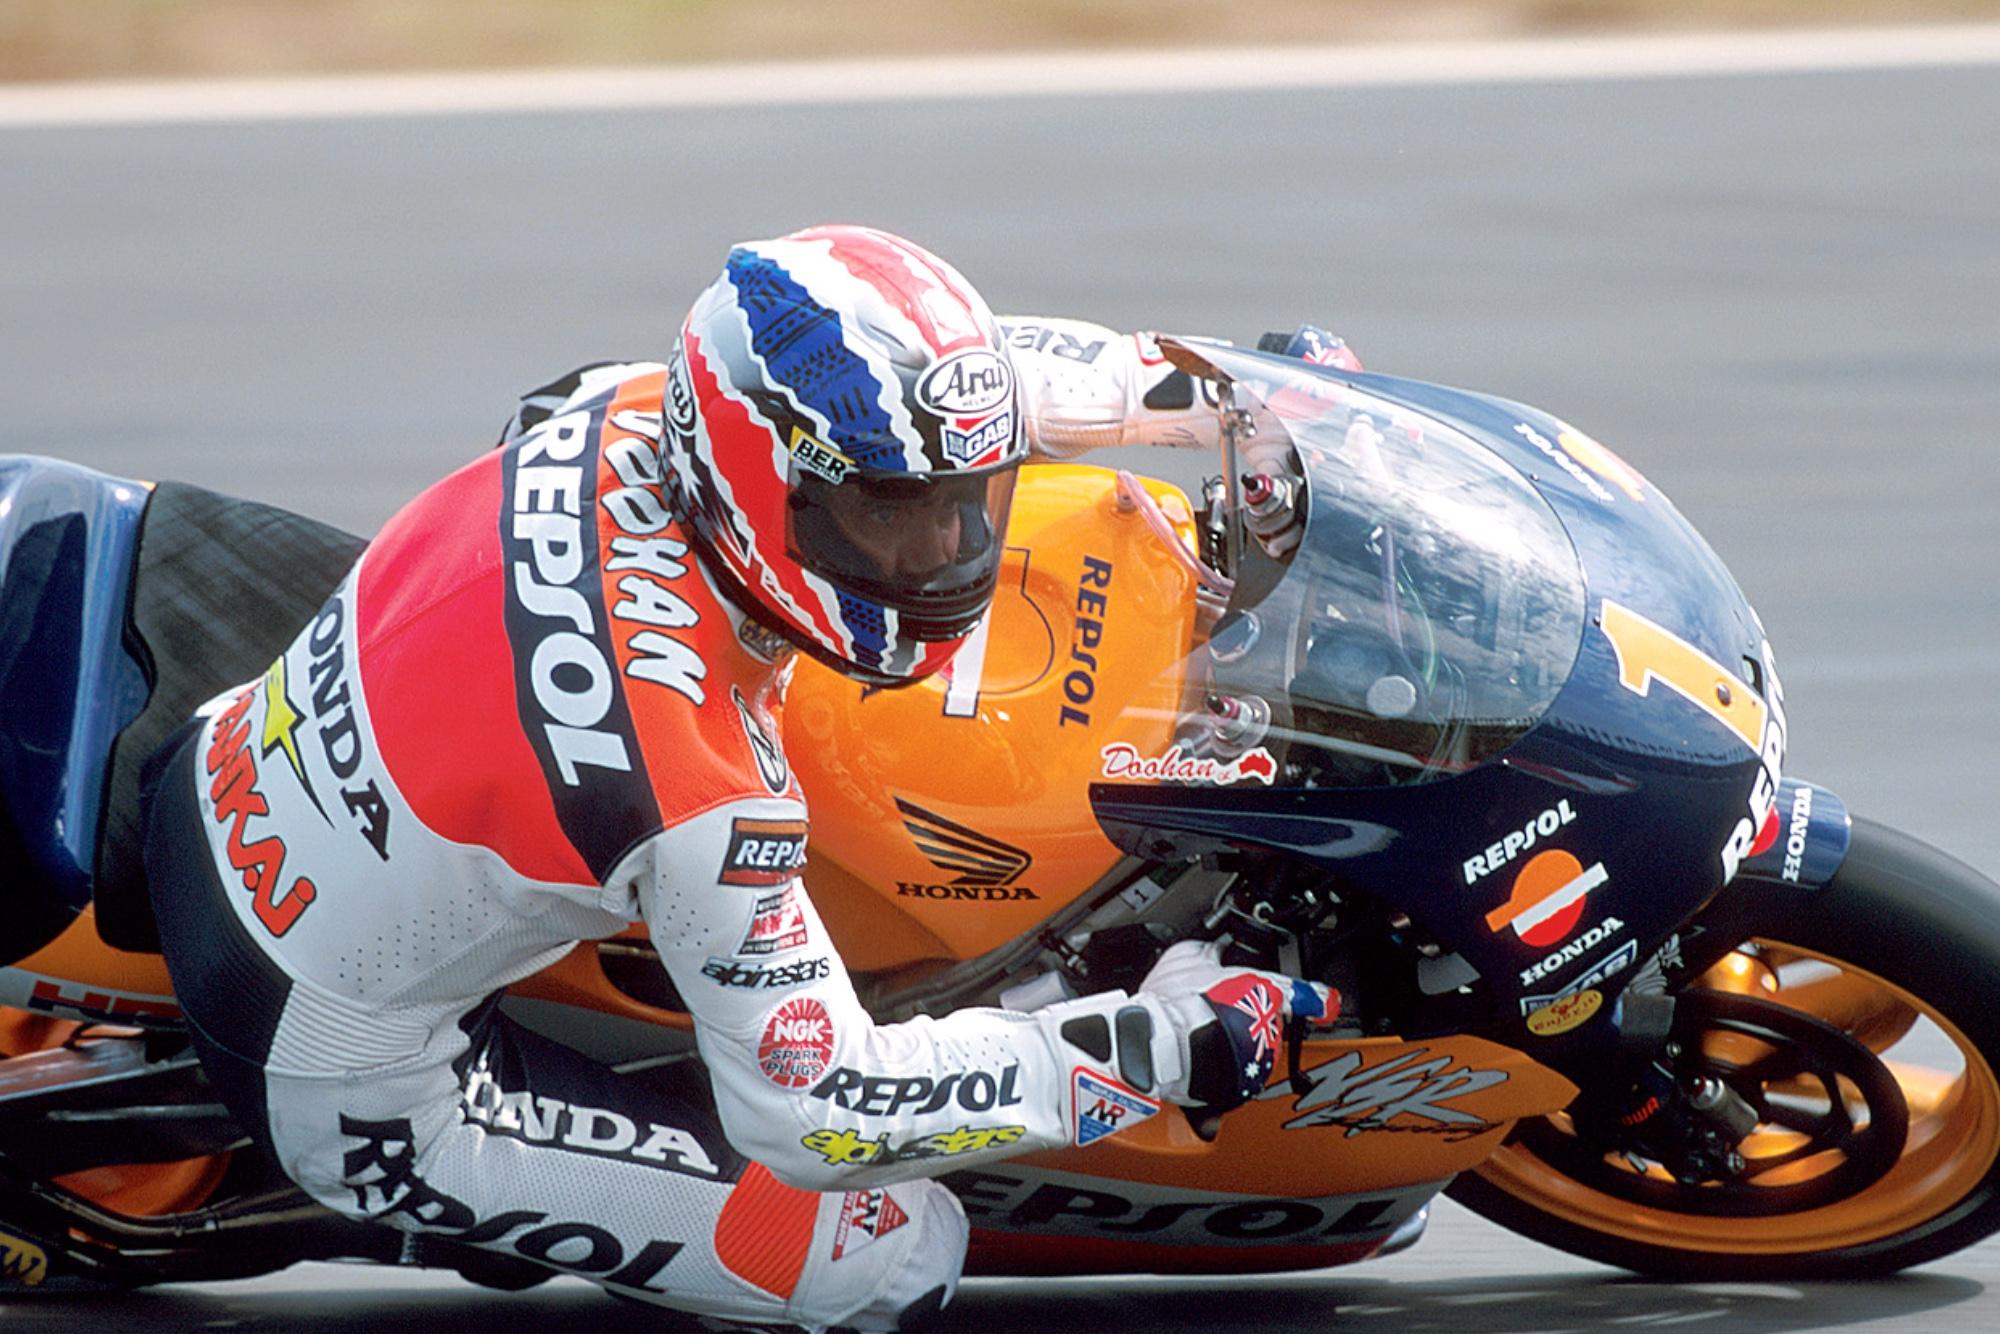 Mick Doohan and MotoGP's greatest comeback